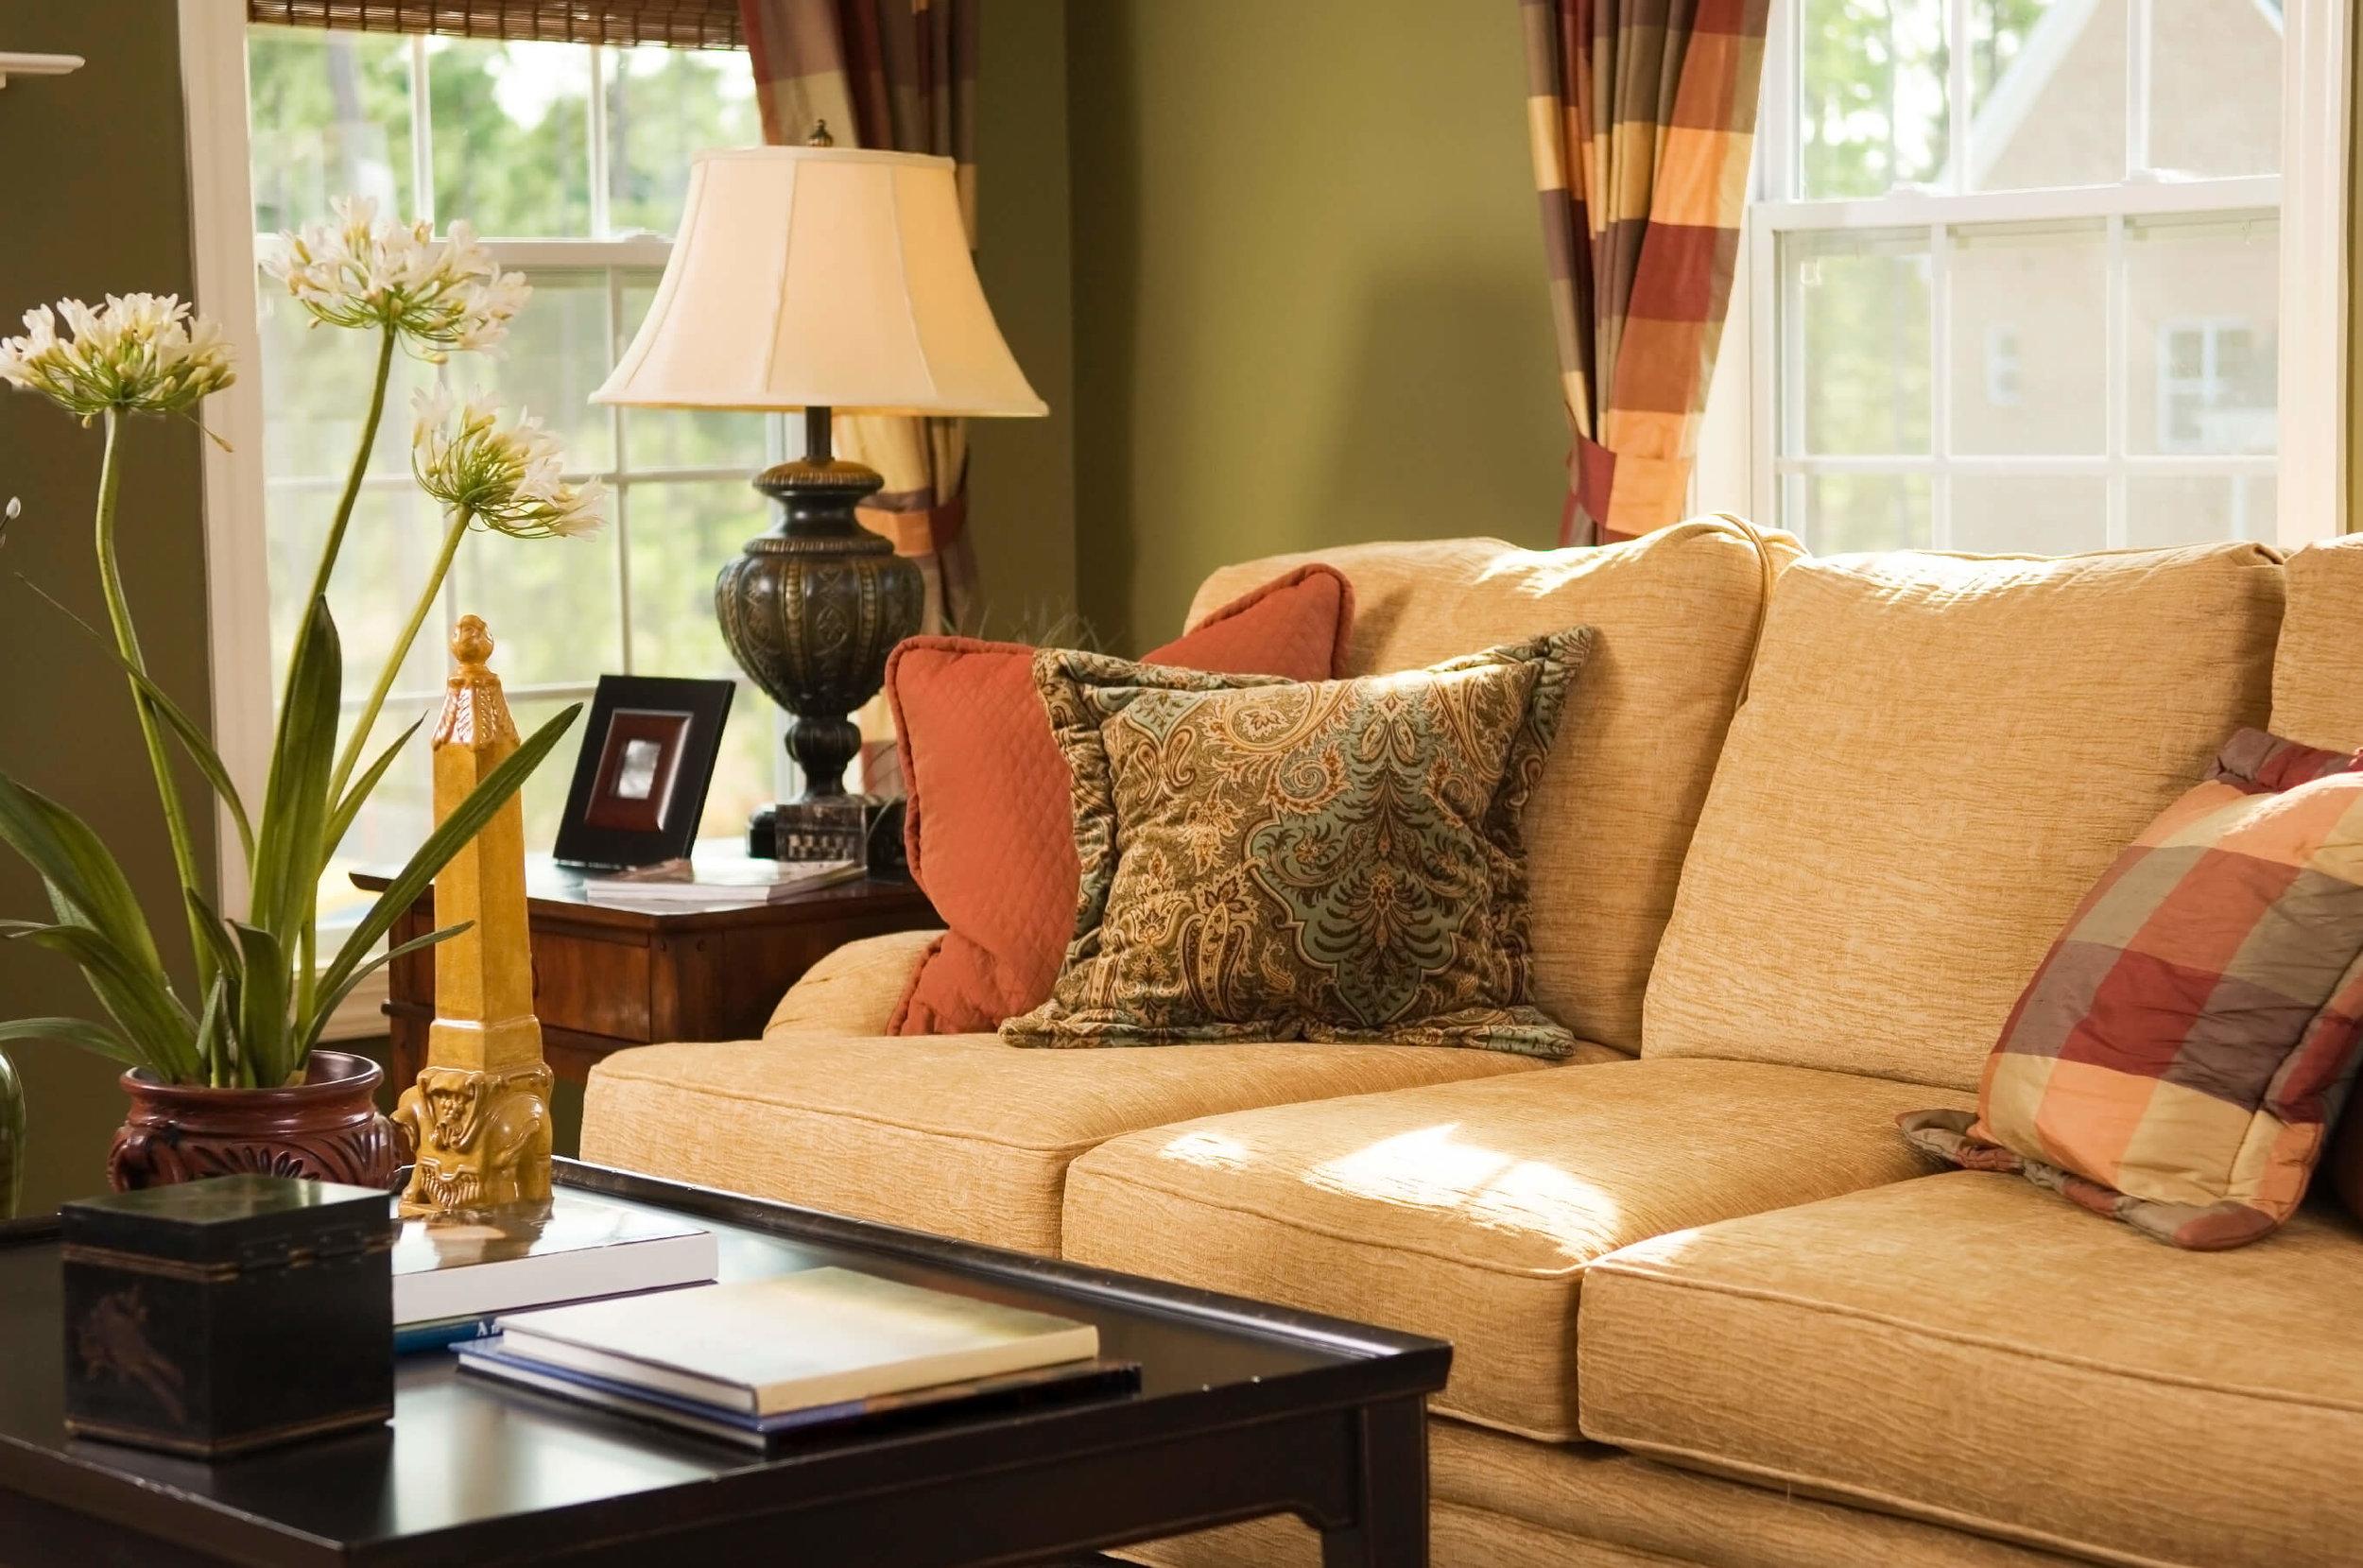 custom-furniture-upholstery-design-atlanta-georgia-16.jpg